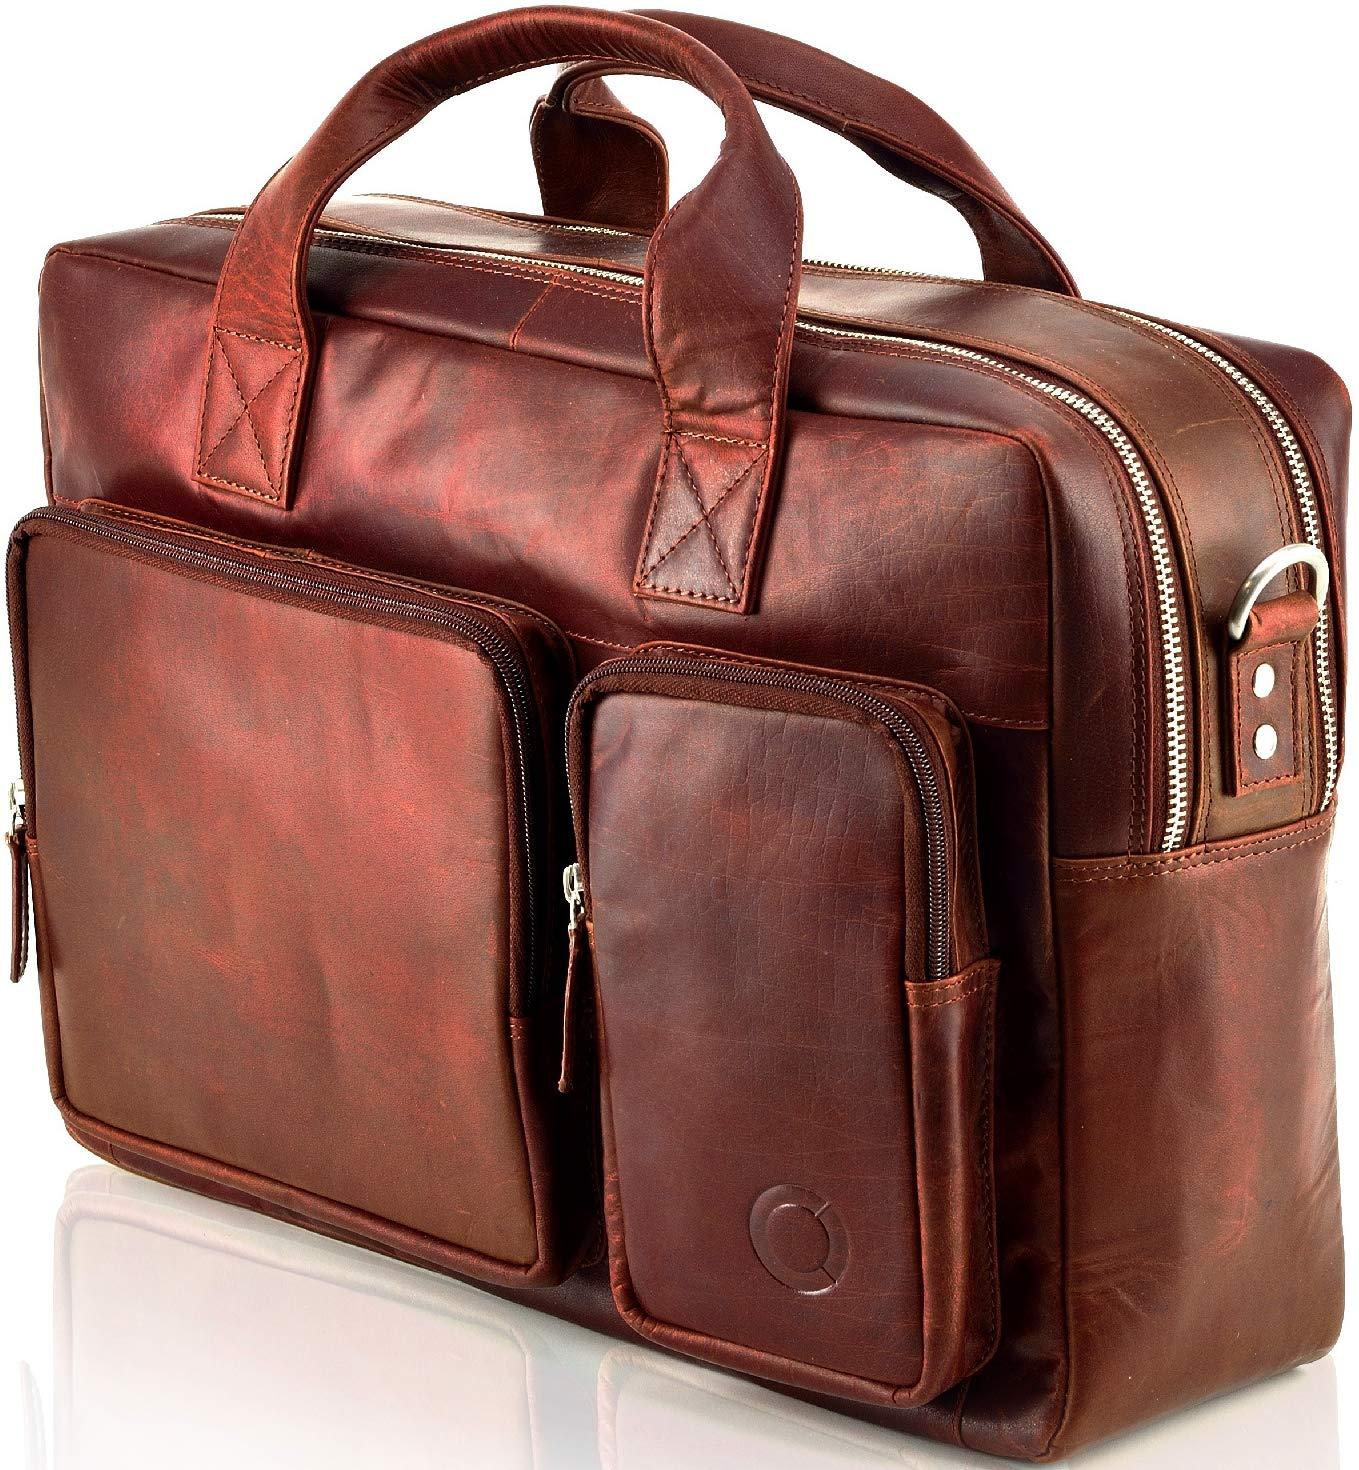 Messenger bag Aktentasche Schultertasche Umhängetasche DIN-A4 Laptoptasche 15, 6 Henkeltasche Echt Leder Schwarz Lima